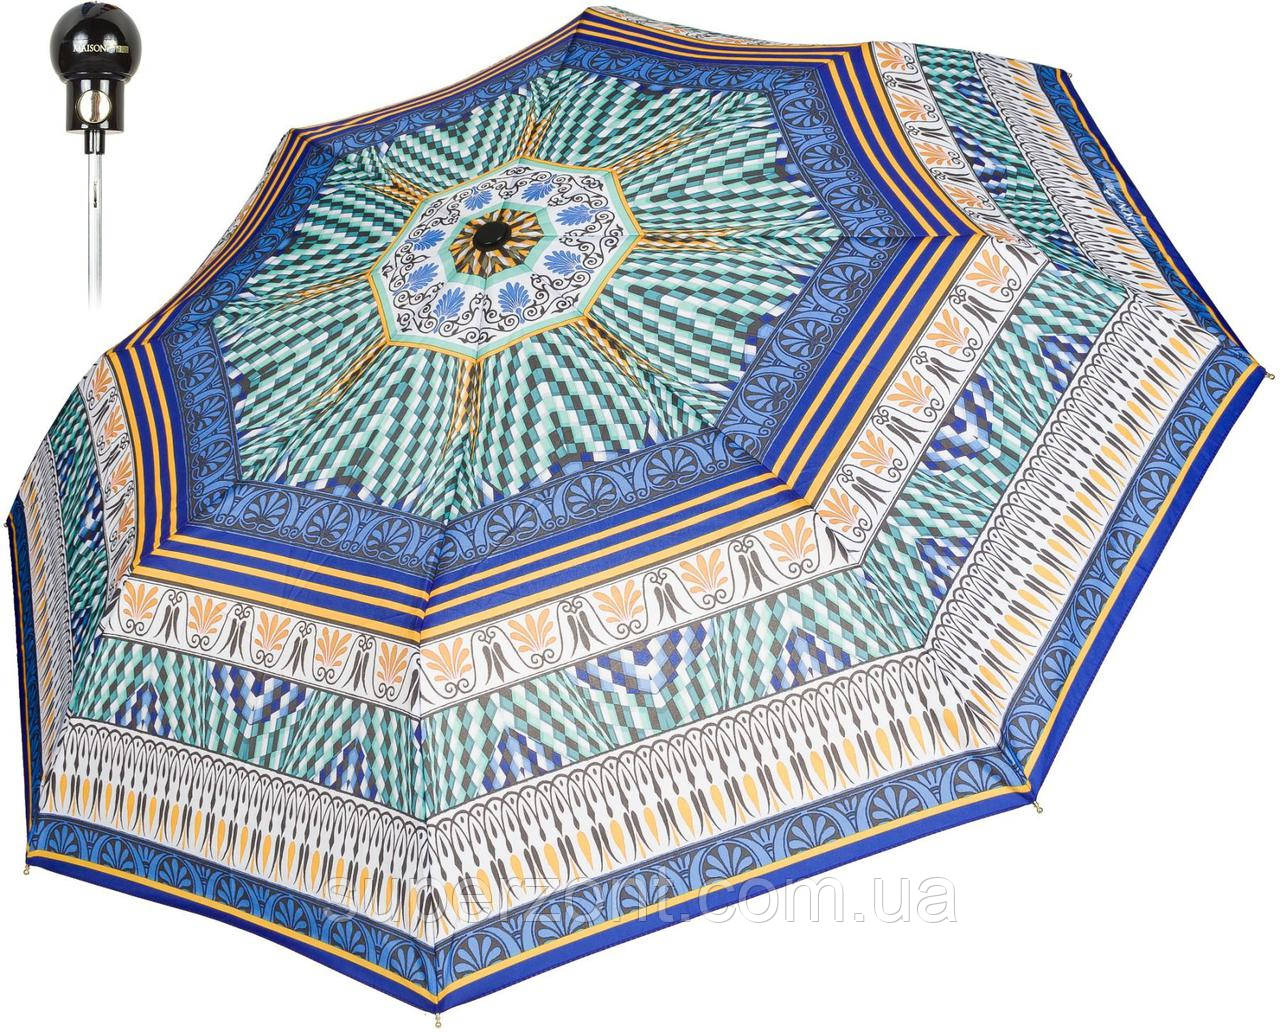 Зонт складной Perletti Mosaic 16239;8700, полуавтомат, синий